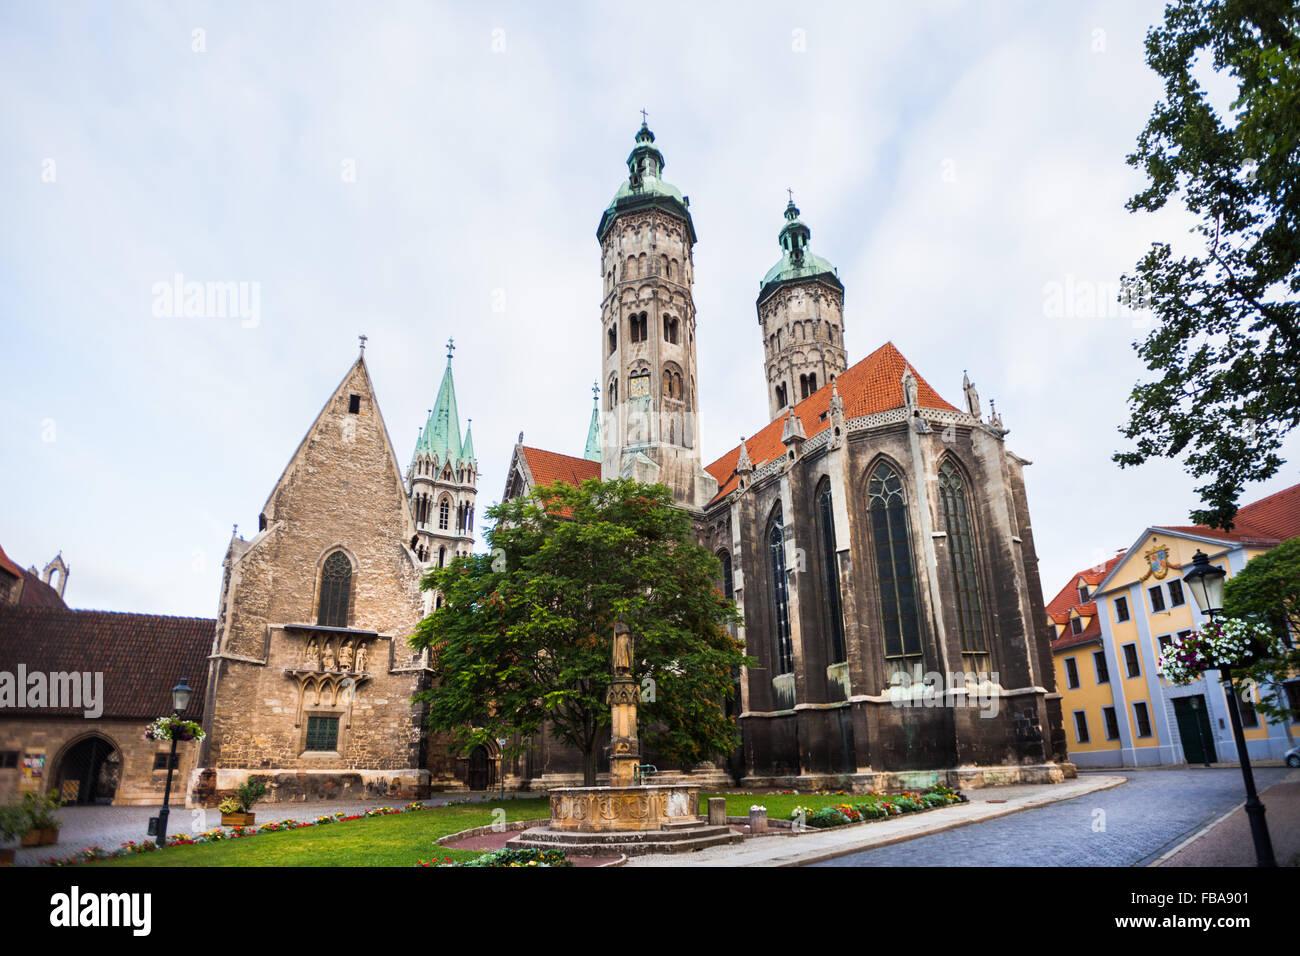 Naumburger Dom (Naumburg Cathedral), Naumburg an der Saale, Germany Stock Photo